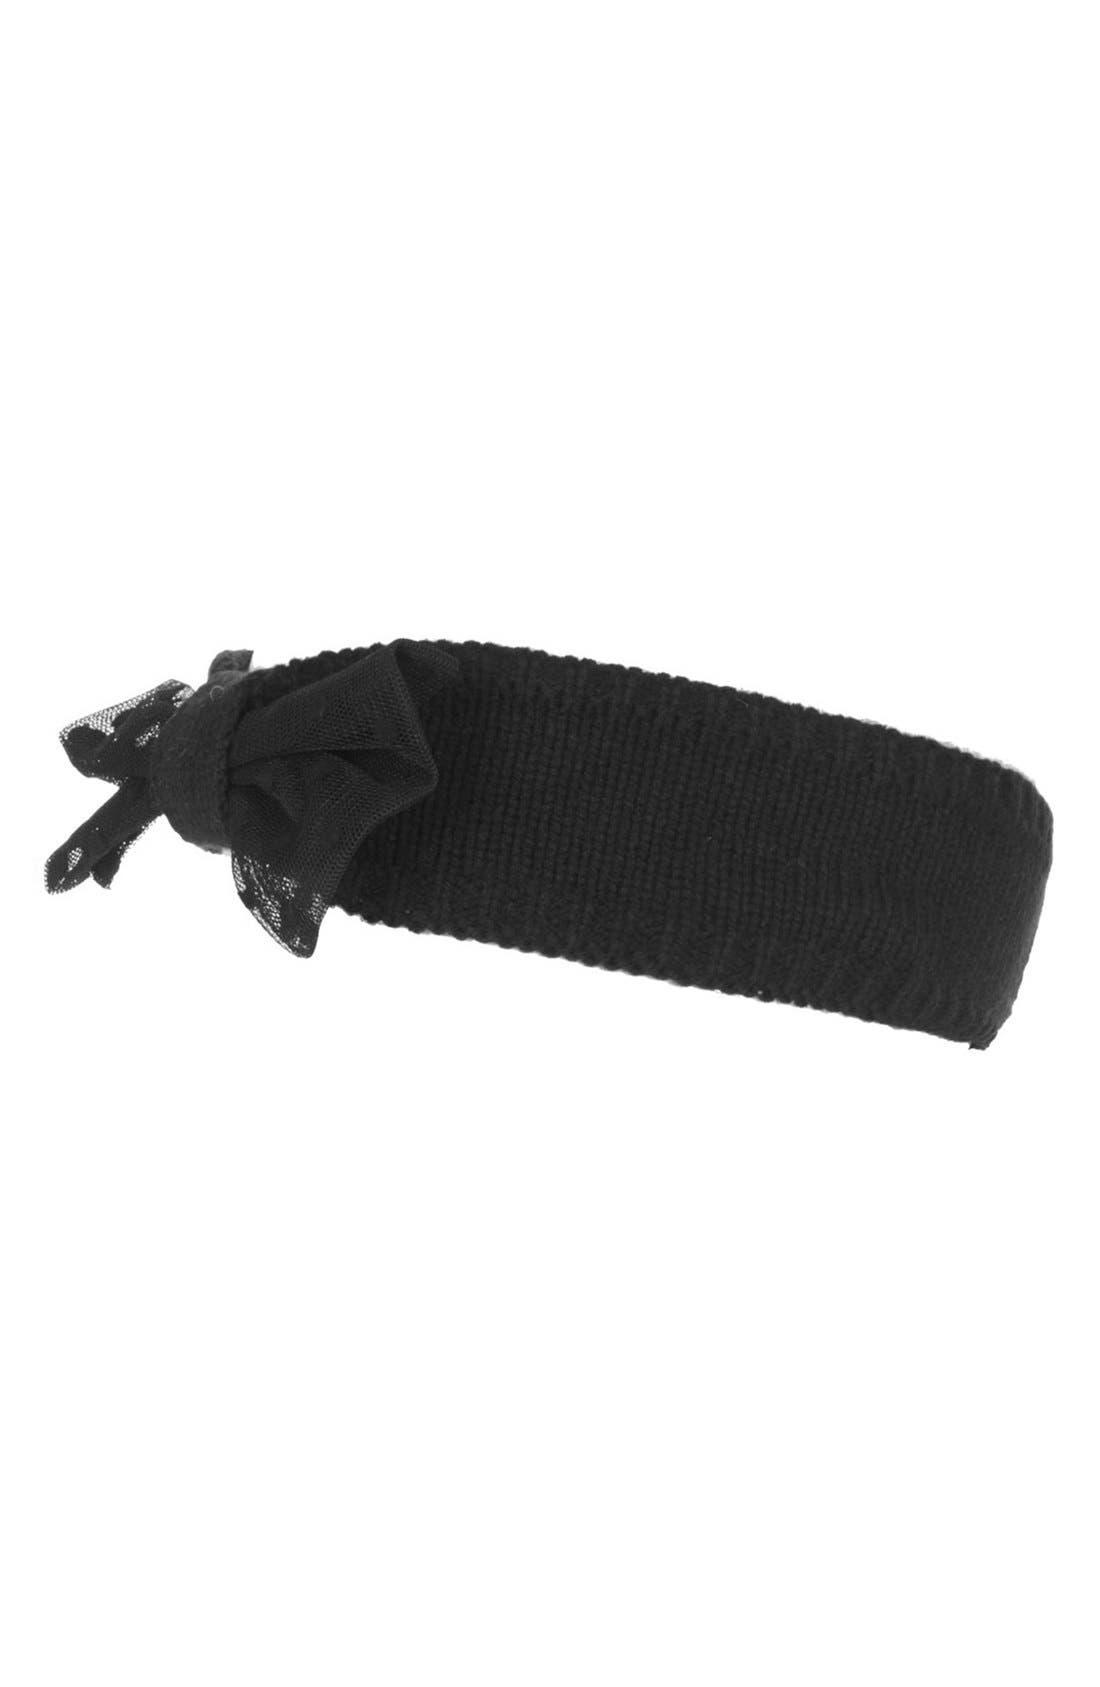 Alternate Image 1 Selected - Topshop Net Bow Headband